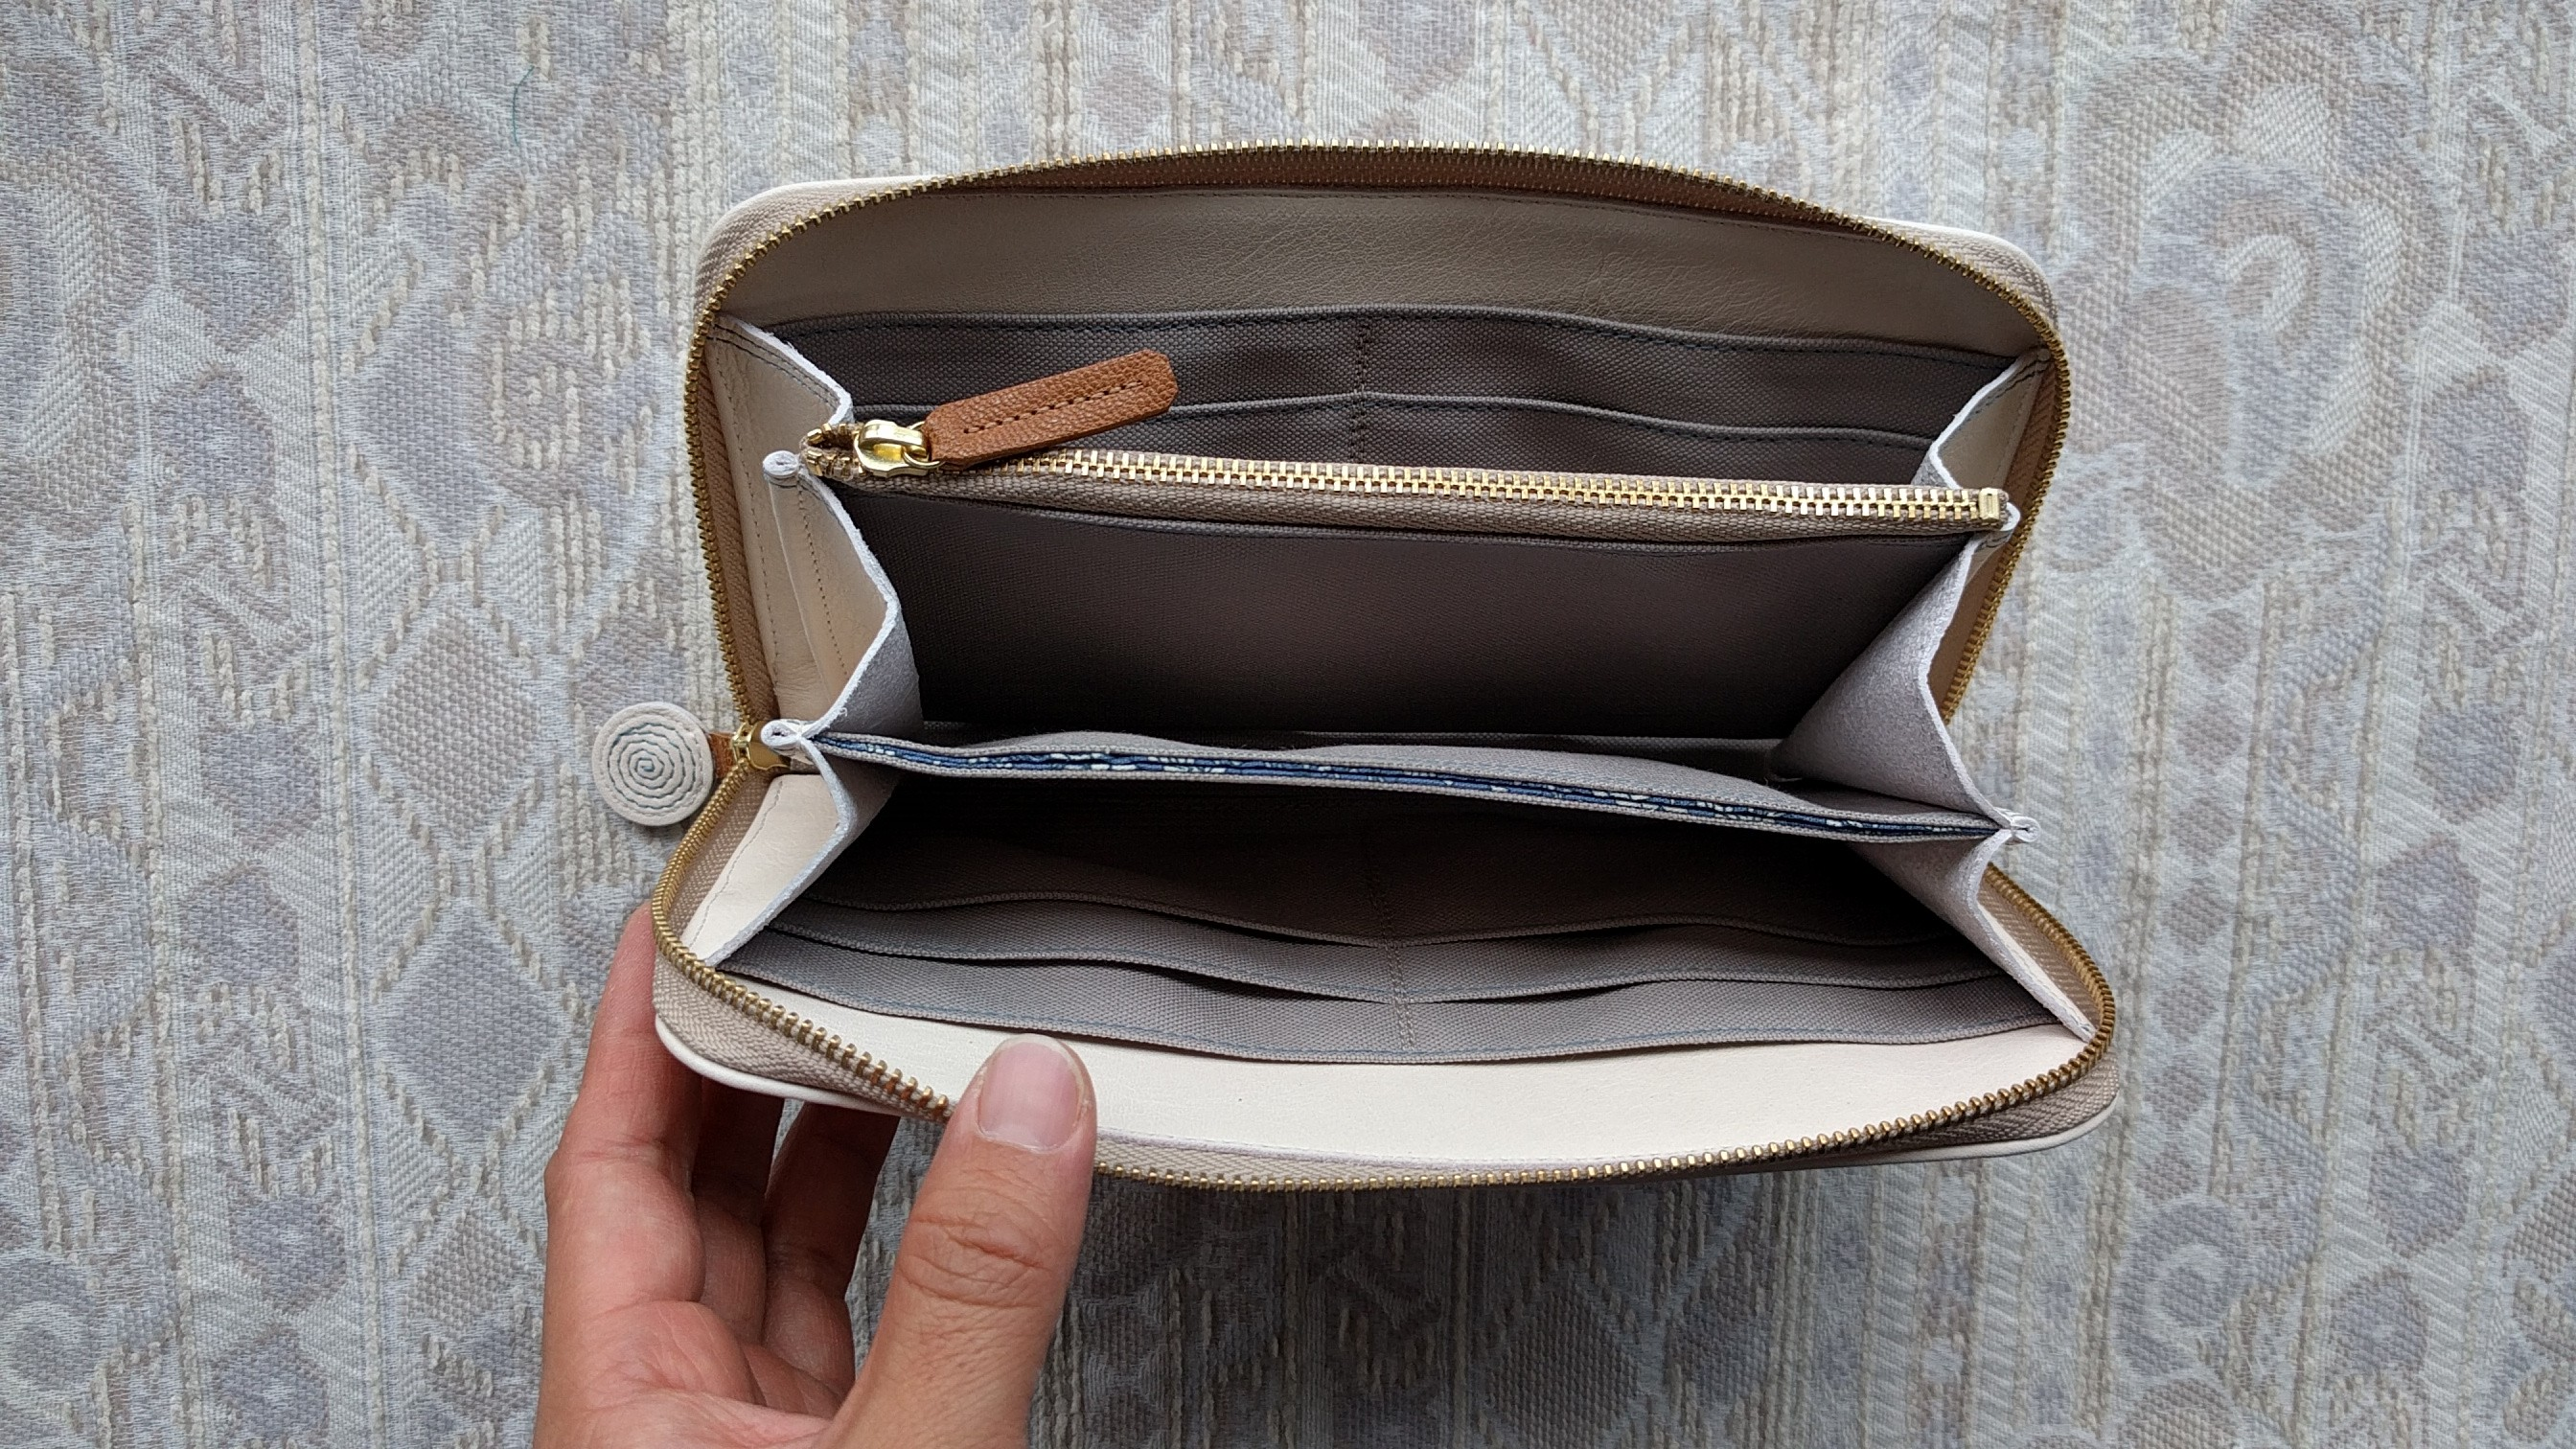 buy popular fdff4 a3faa 刺繍革財布『ぐるぐる』オフホワイト×暗い水色(牛革)ラウンドファスナー